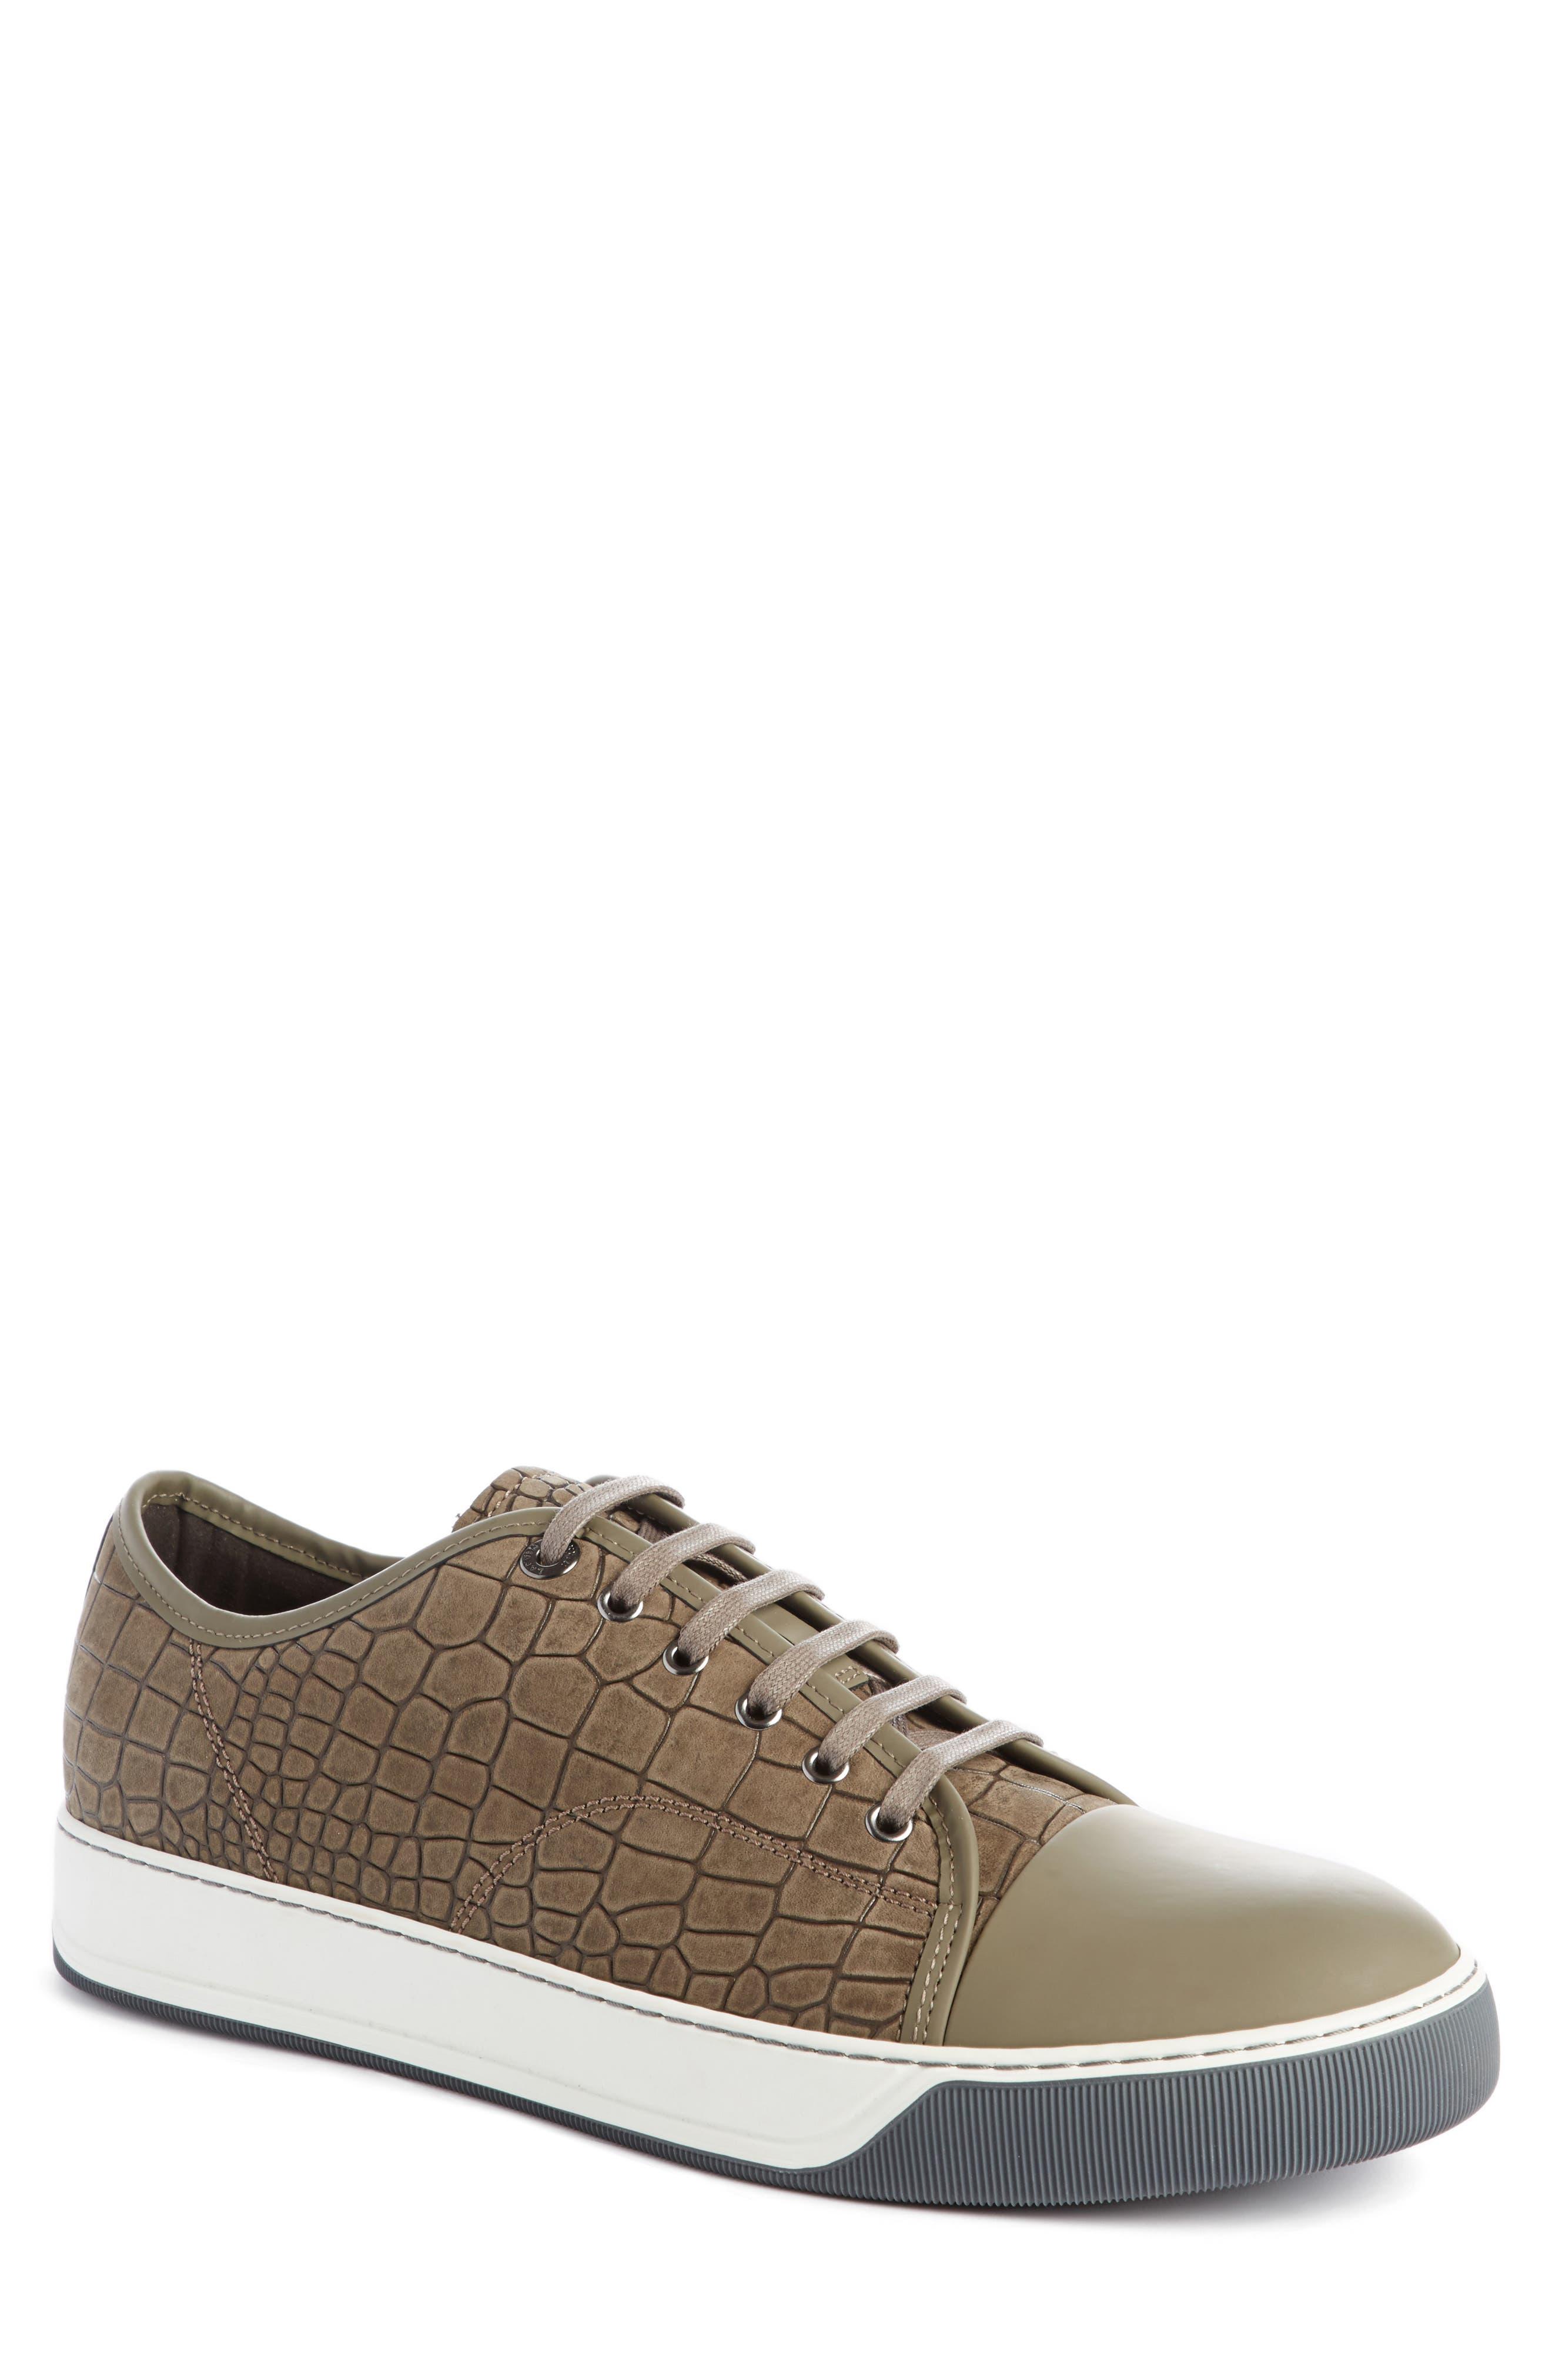 Alternate Image 1 Selected - Lanvin Embossed Nubuck Low Top Sneaker (Men)